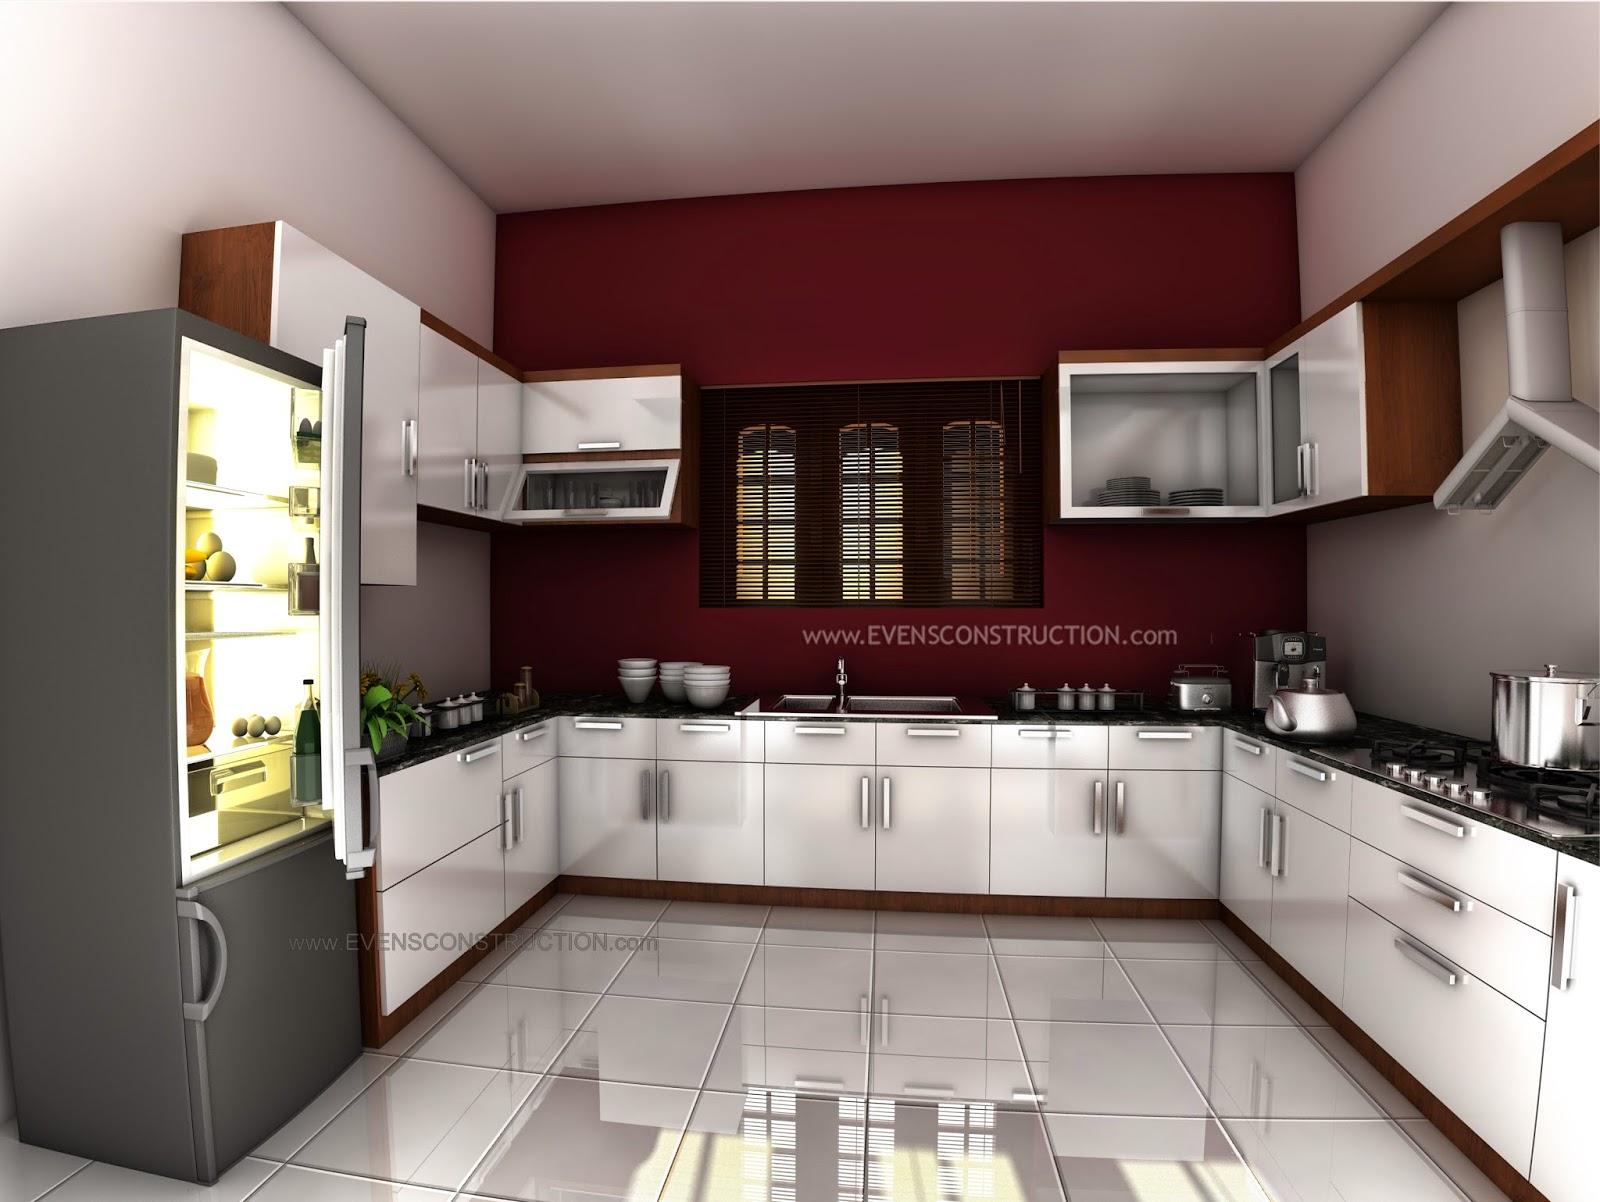 Evens Construction Pvt Ltd: Beautiful Kerala Kitchen